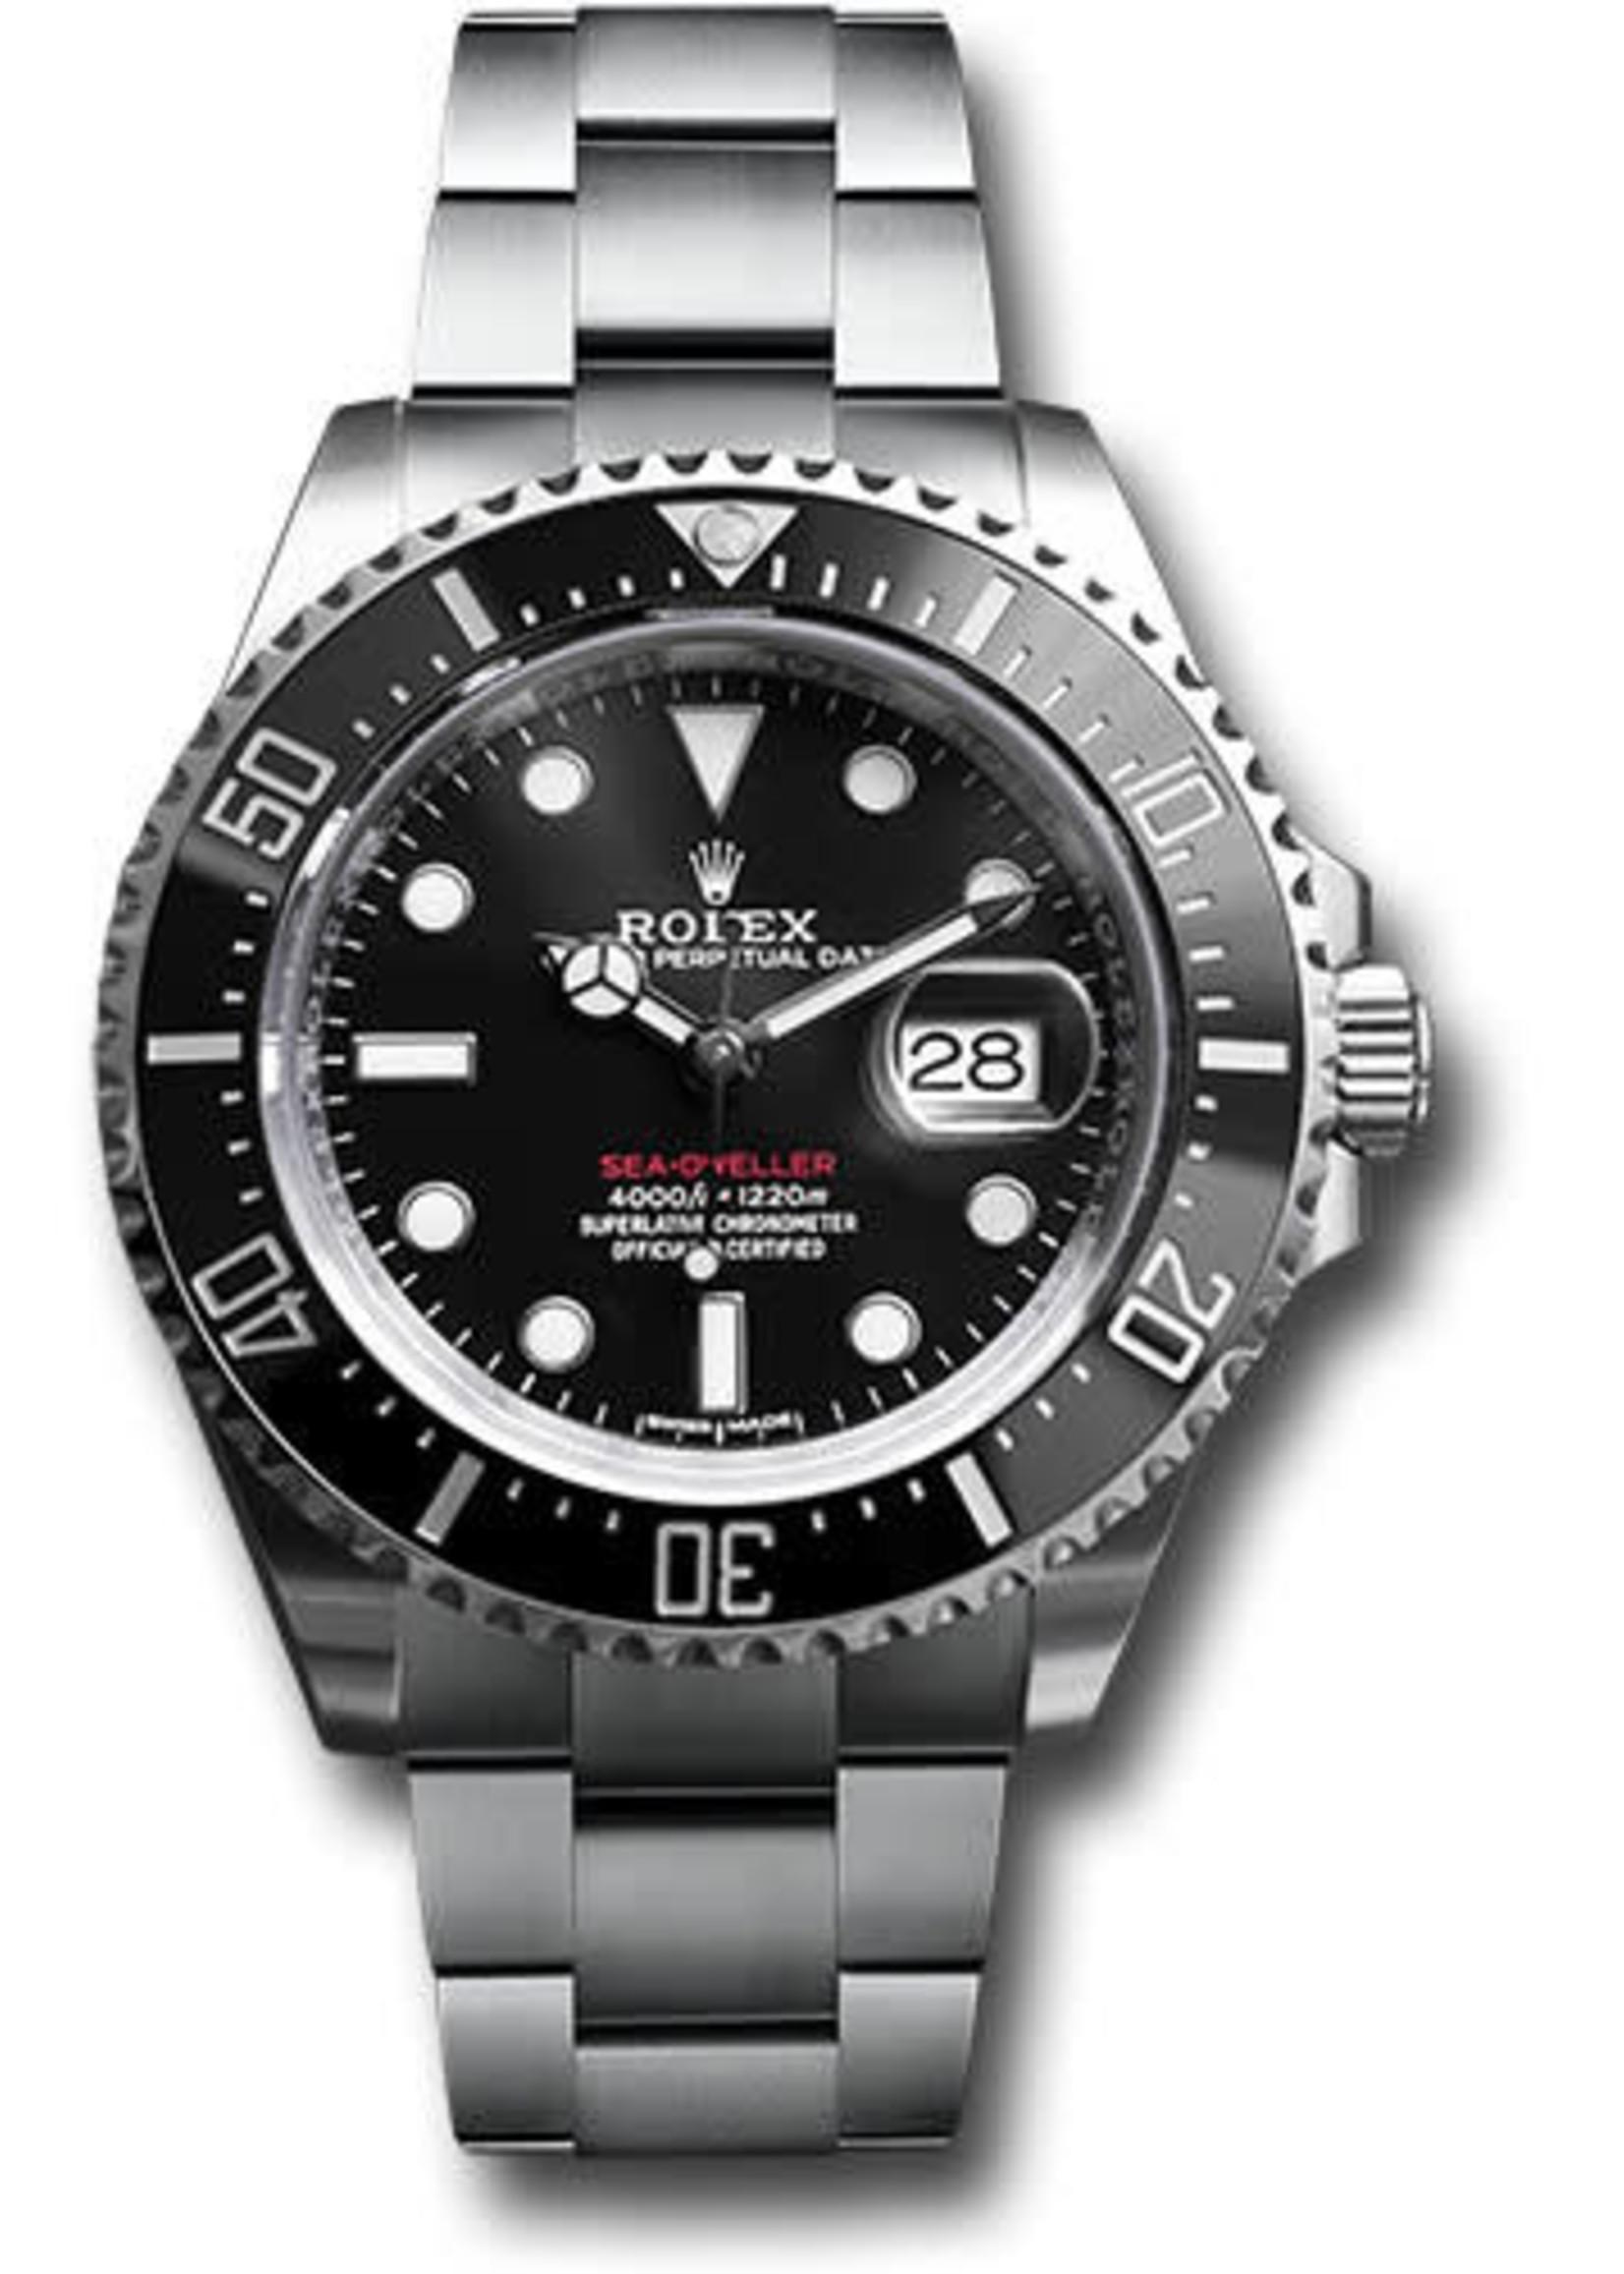 Rolex ROLEX SEA-DWELLER 43MM (2018 B + P) #126600